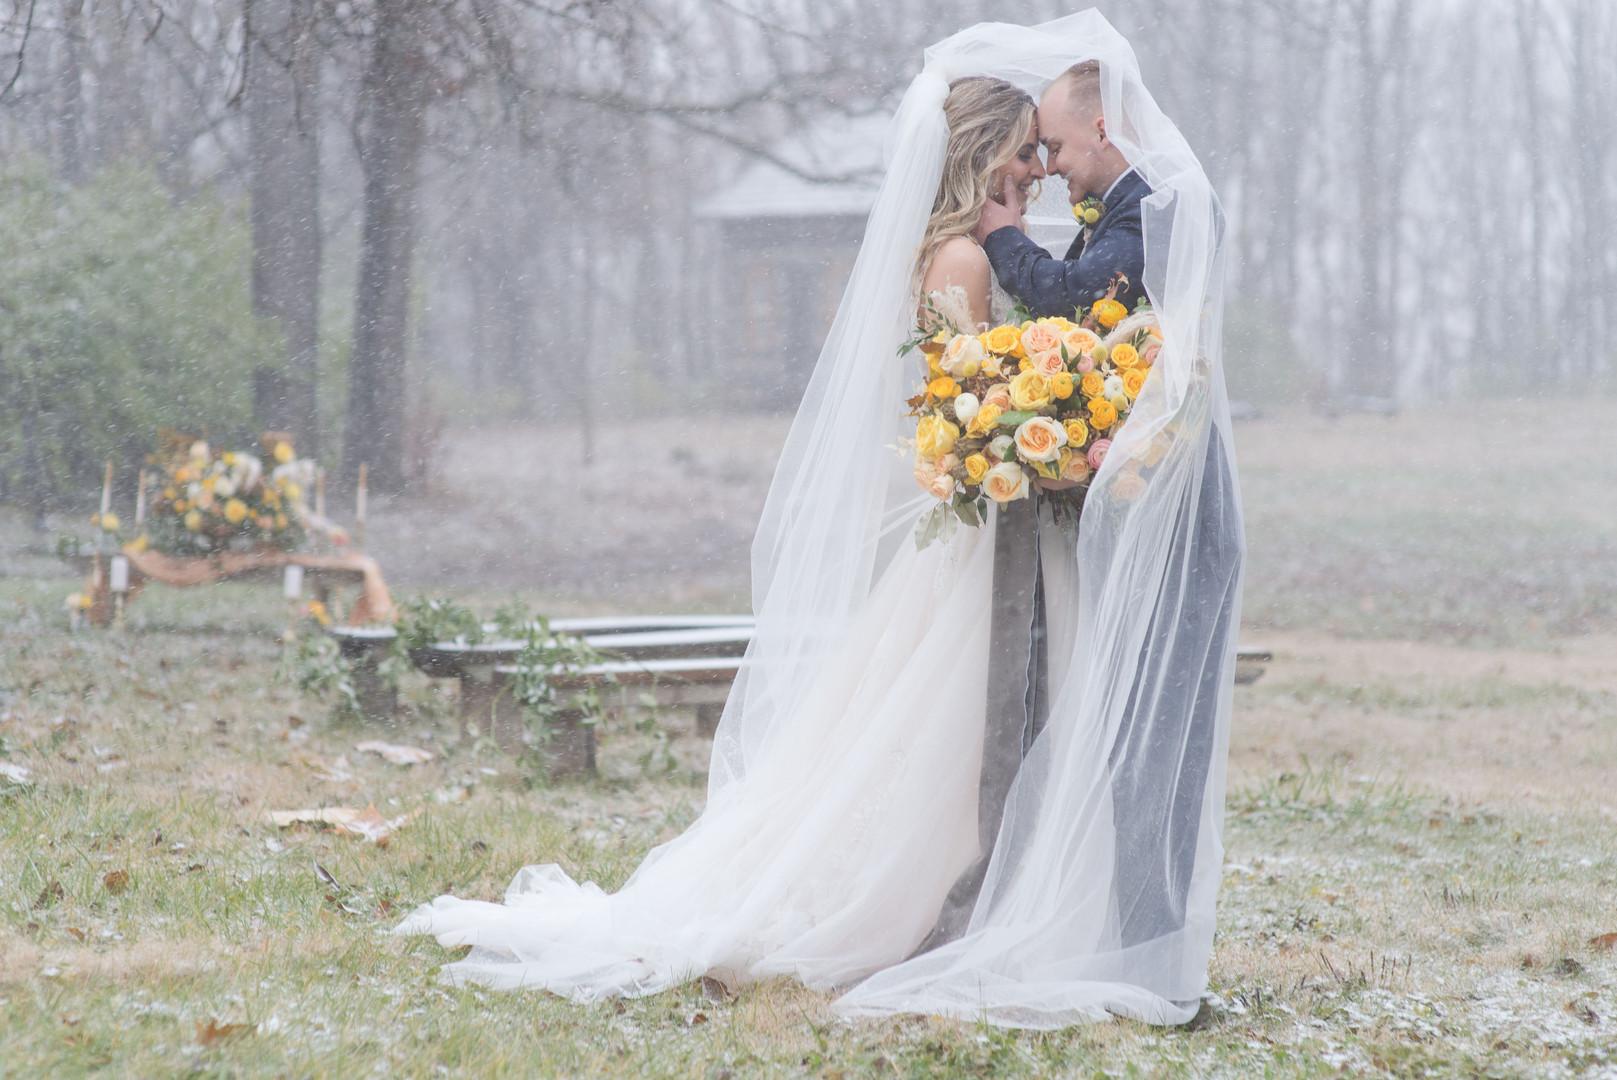 Snowy Bride and Groom